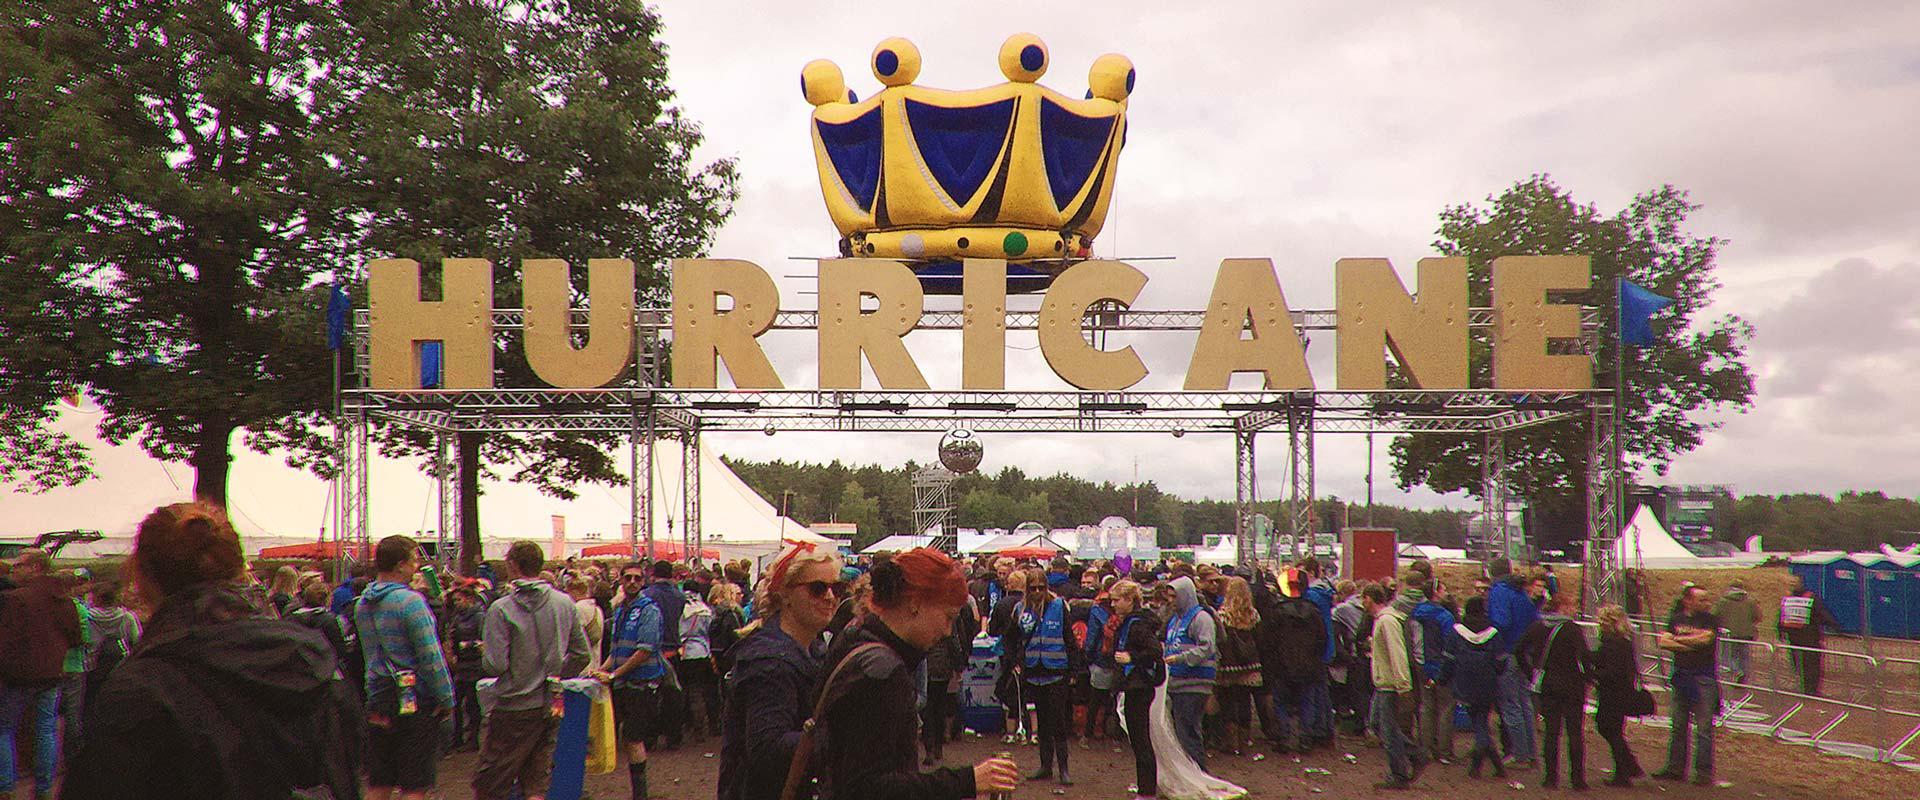 Hurricane 2015: Bier. Bühnen. Beats.